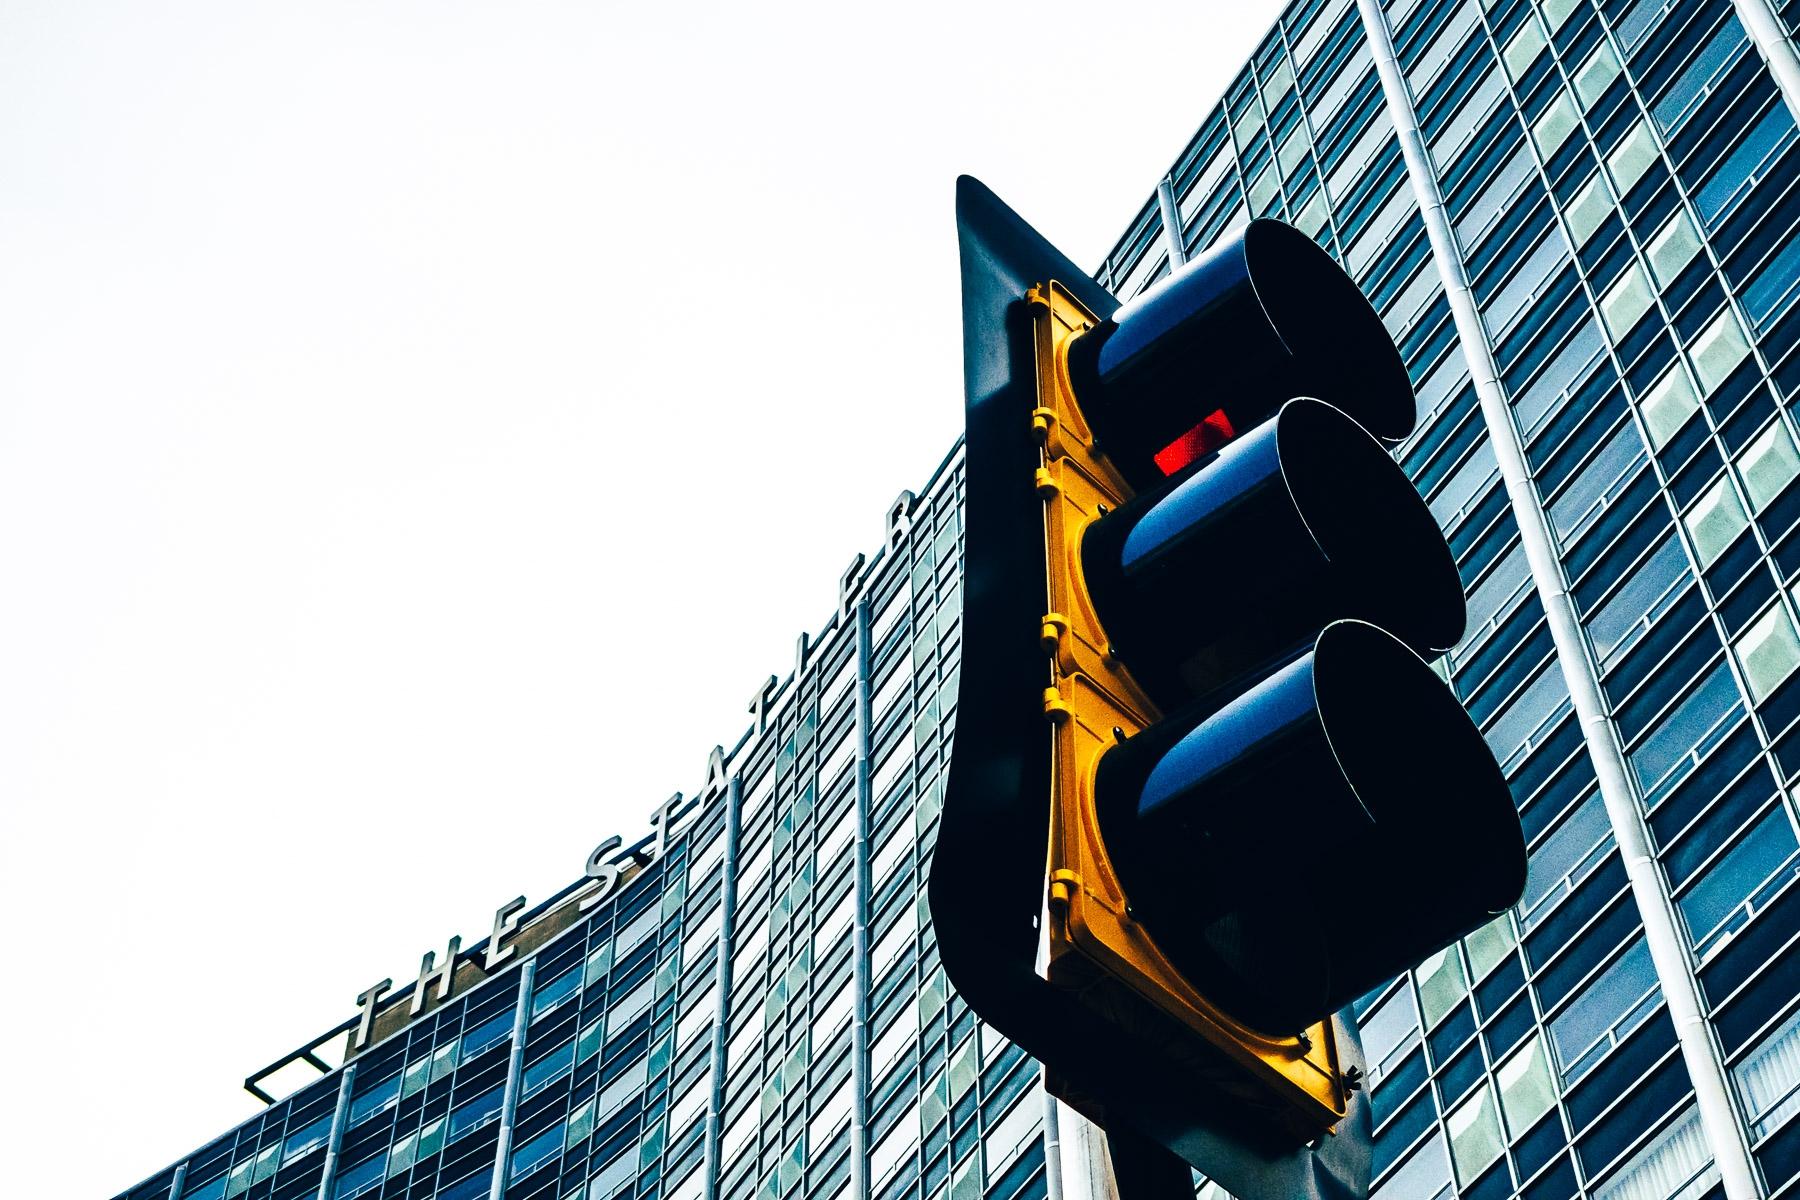 Statler Stoplight stoplight hot - 75centralphotography   ello